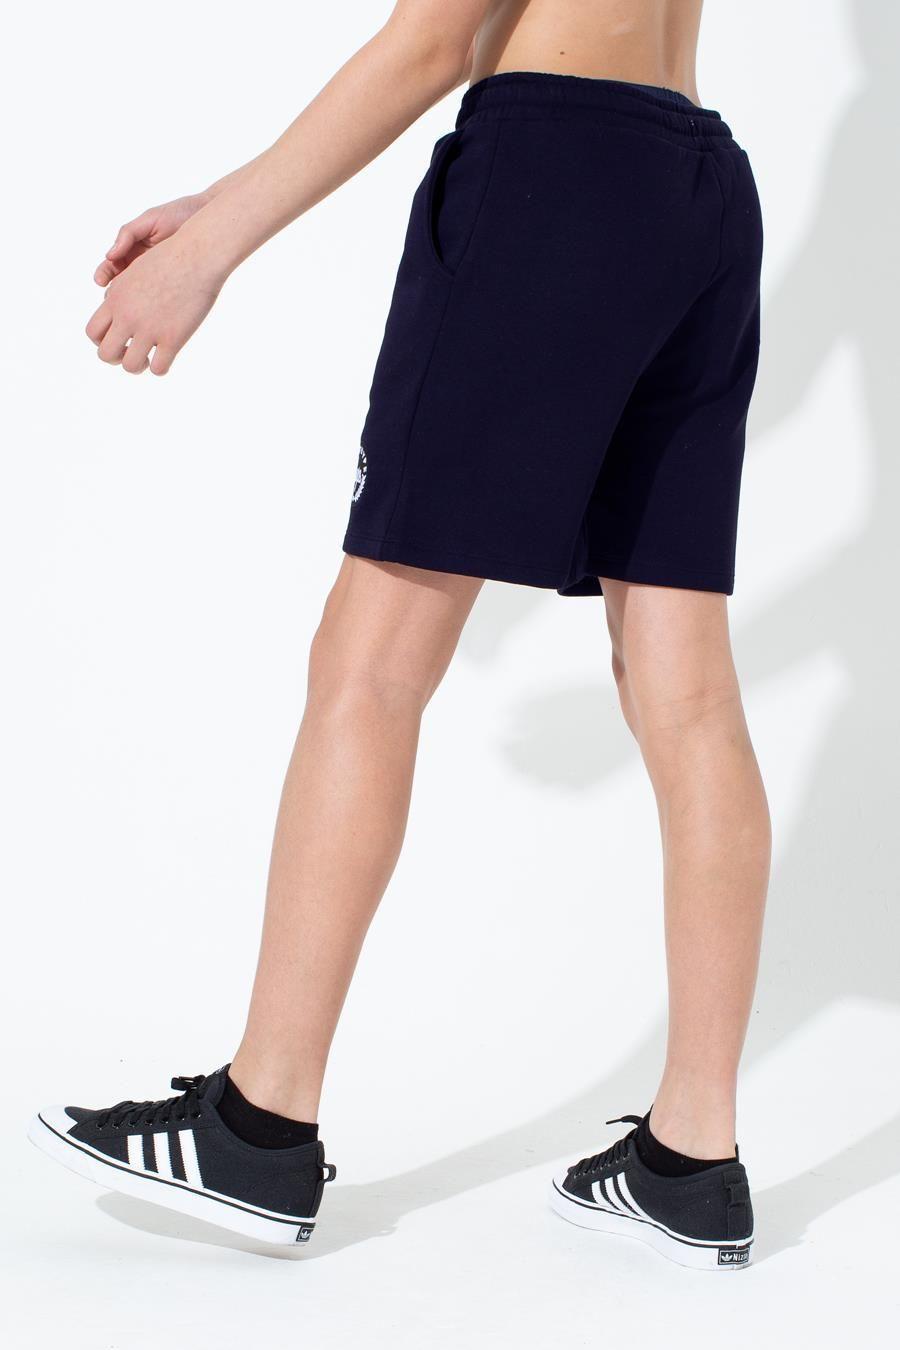 Hype Navy Crest Kids Shorts